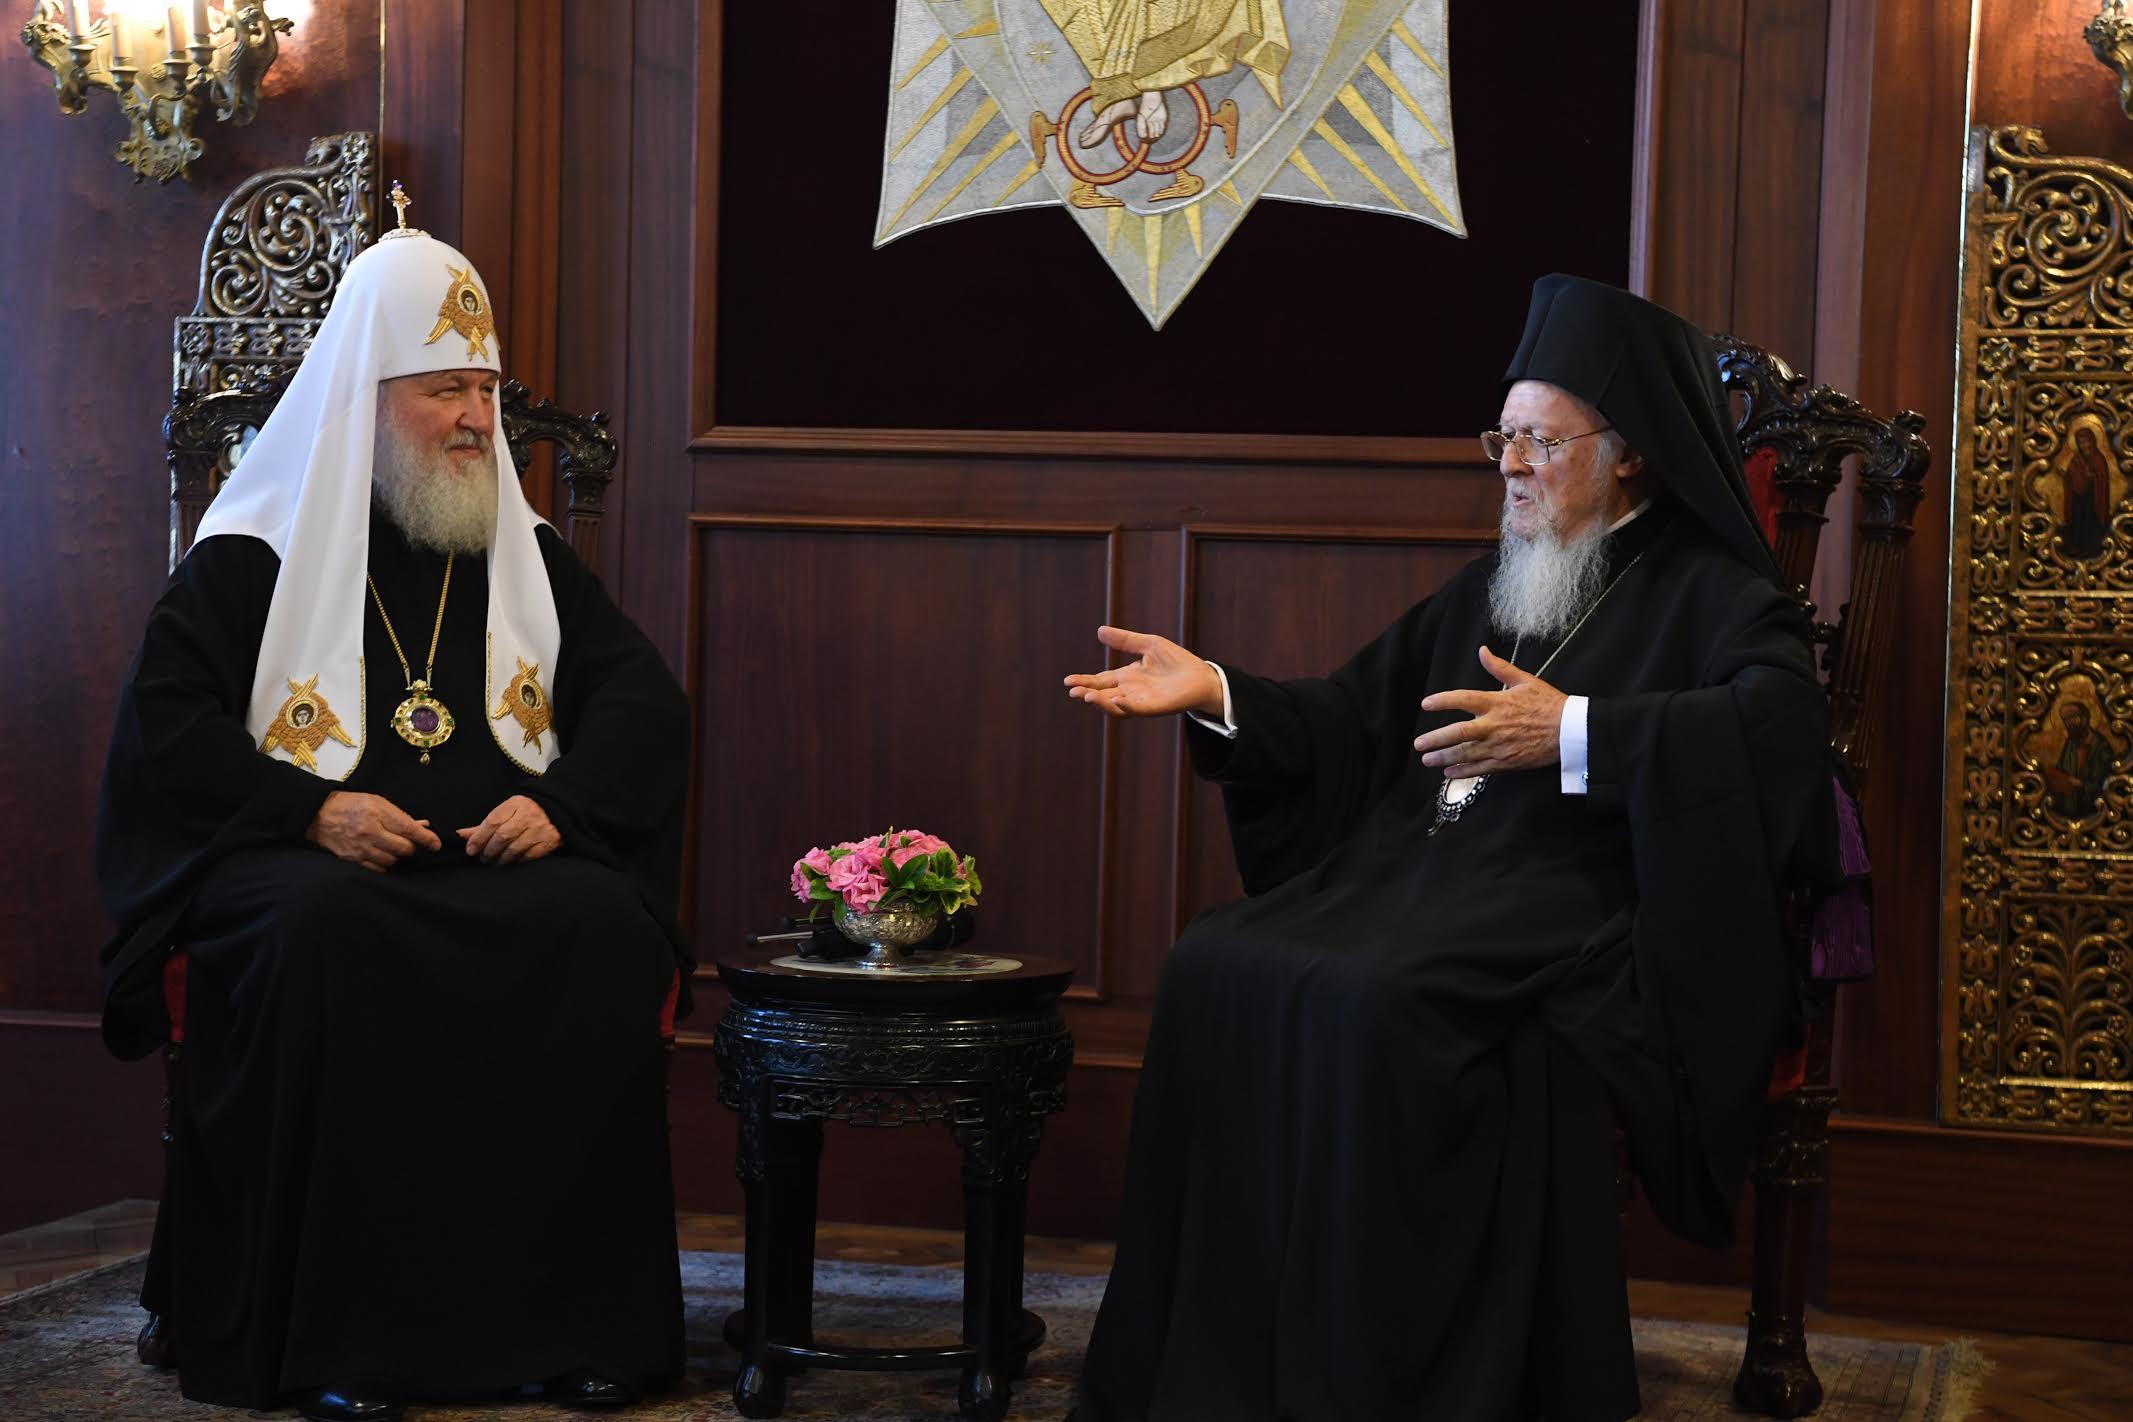 Patriarch Kirill of Moscow pays visit toEcumenical PatriarchBartholomew I